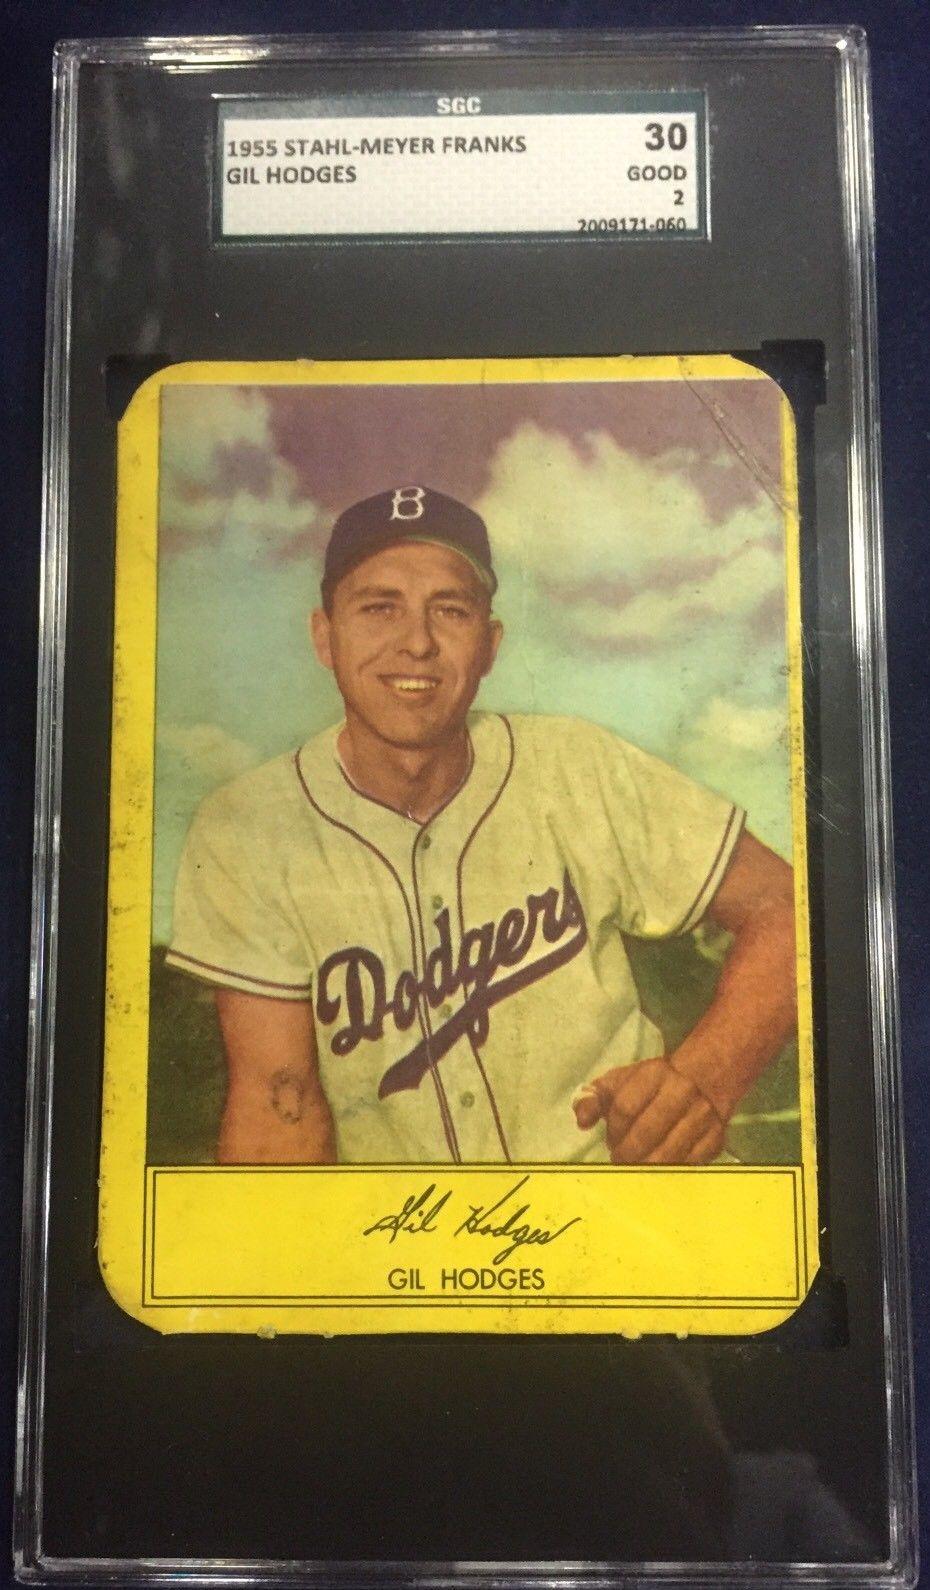 1955 Stahl-Meyer Franks Gil Hodges, Brooklyn Dodgers WS Card Sgc 2 Graded